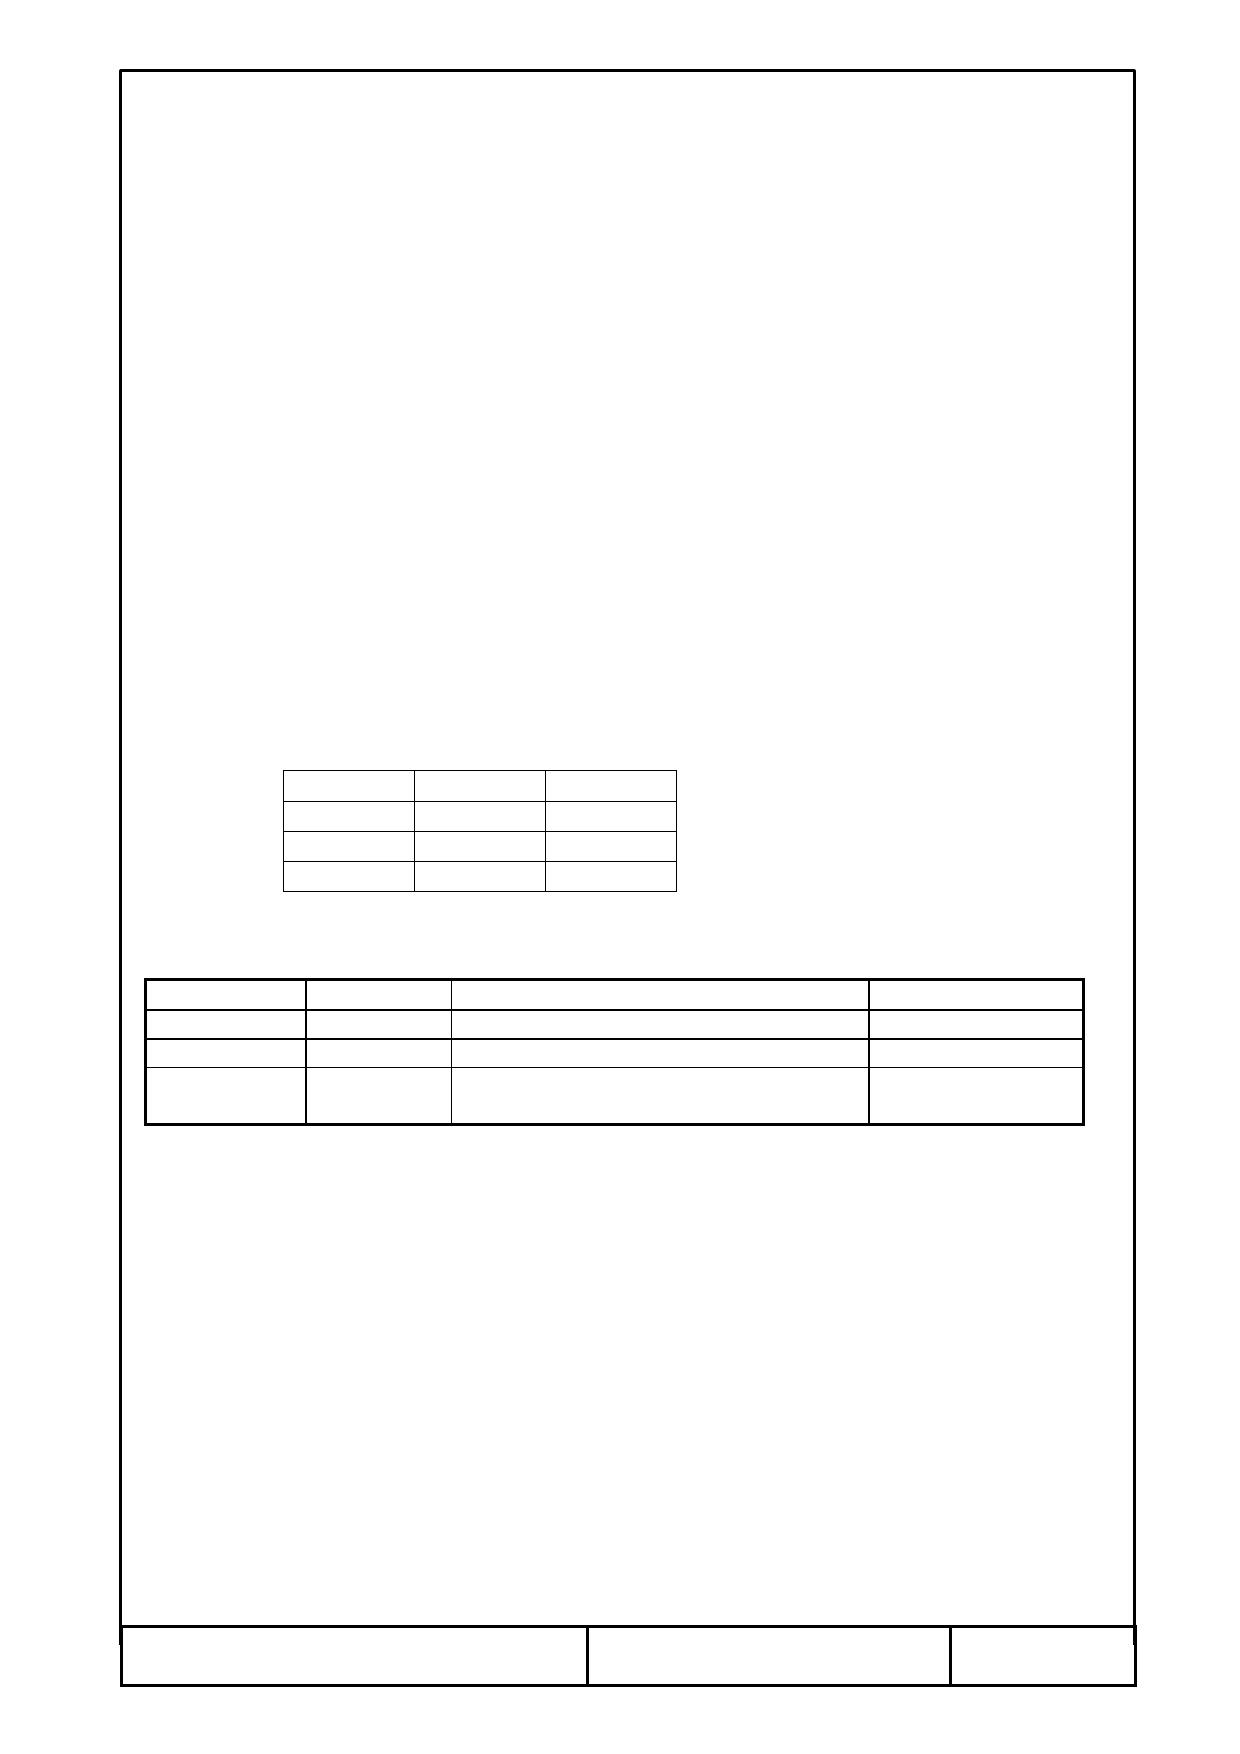 T-51384L079J_FW_P_AA pdf